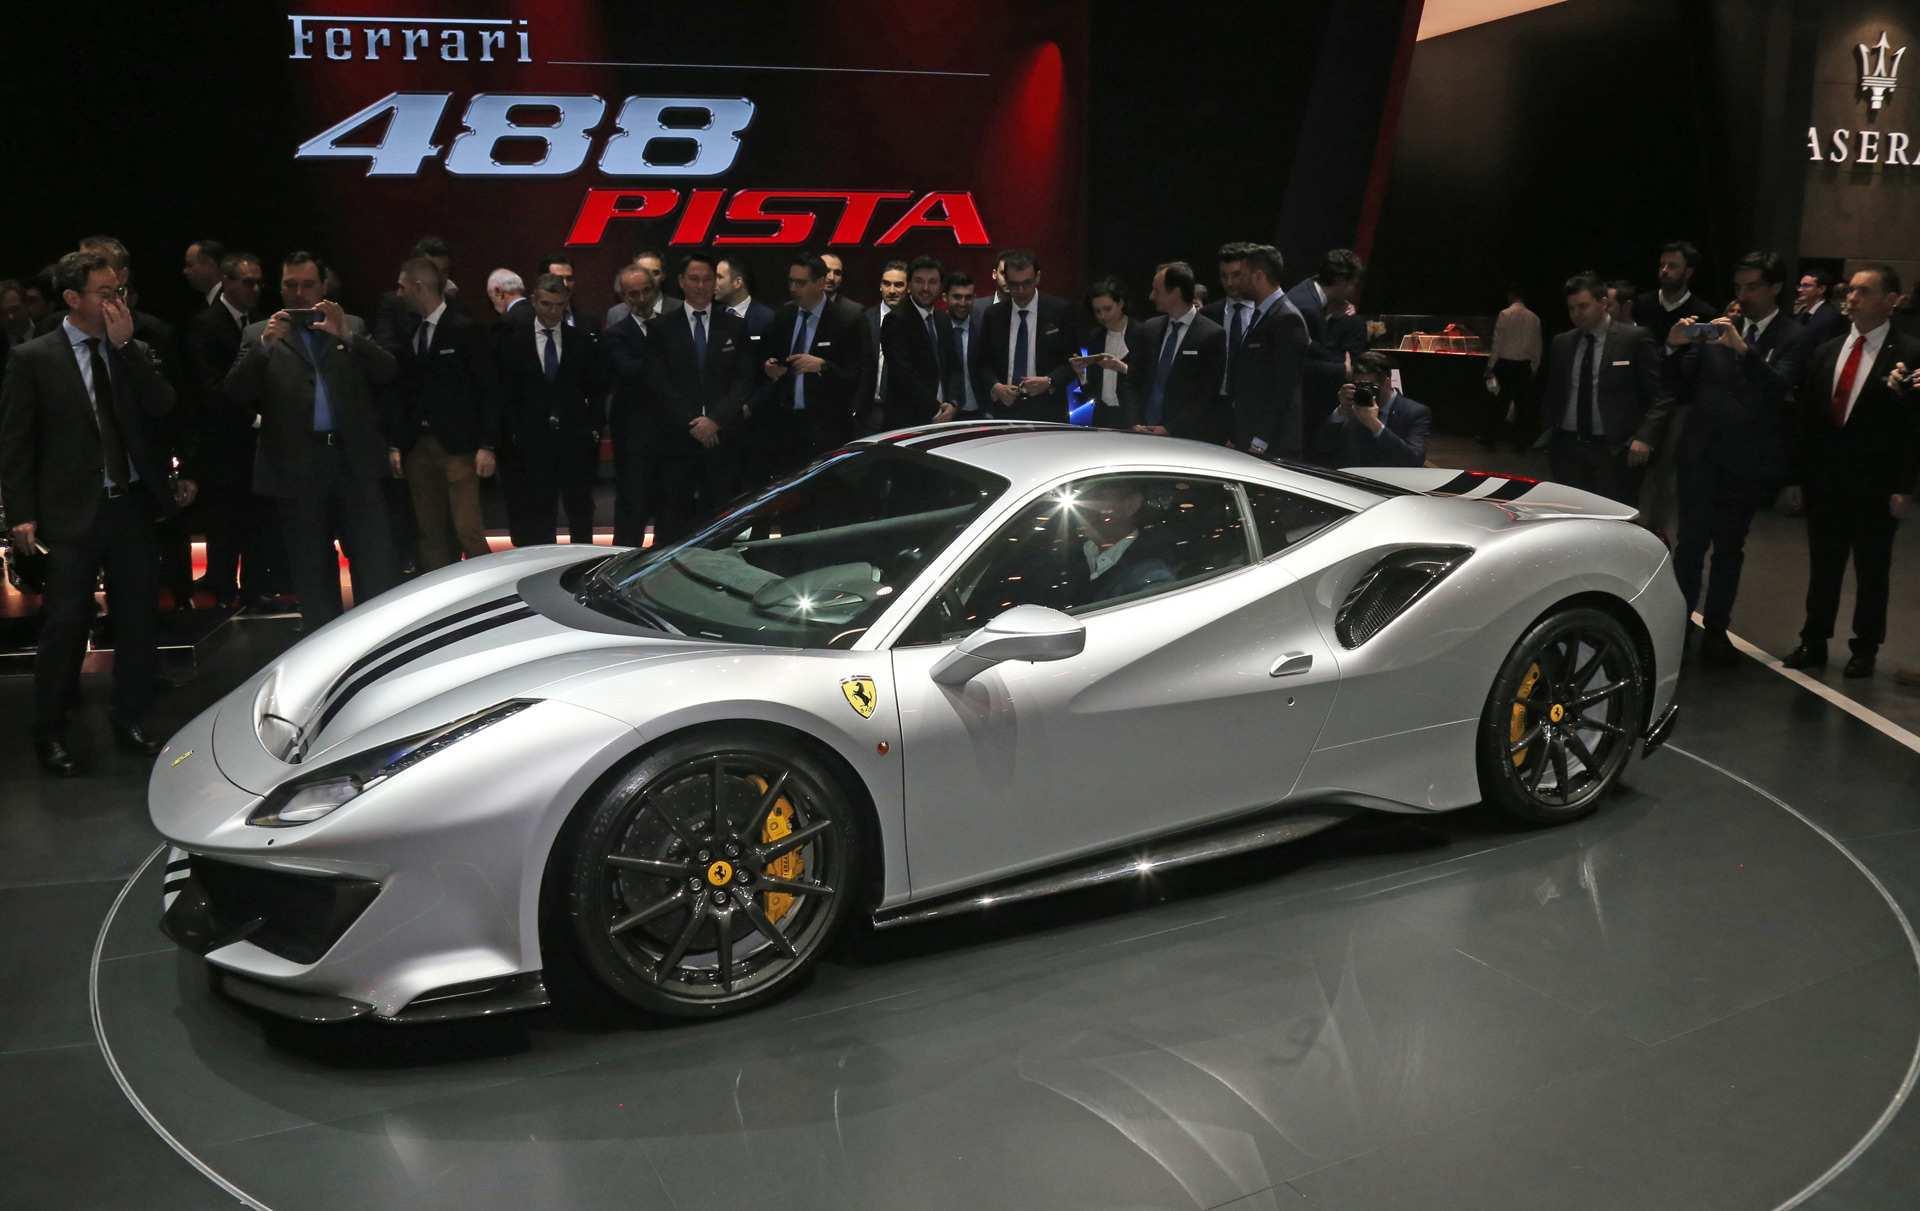 15 All New 2019 Ferrari 588 Performance with 2019 Ferrari 588